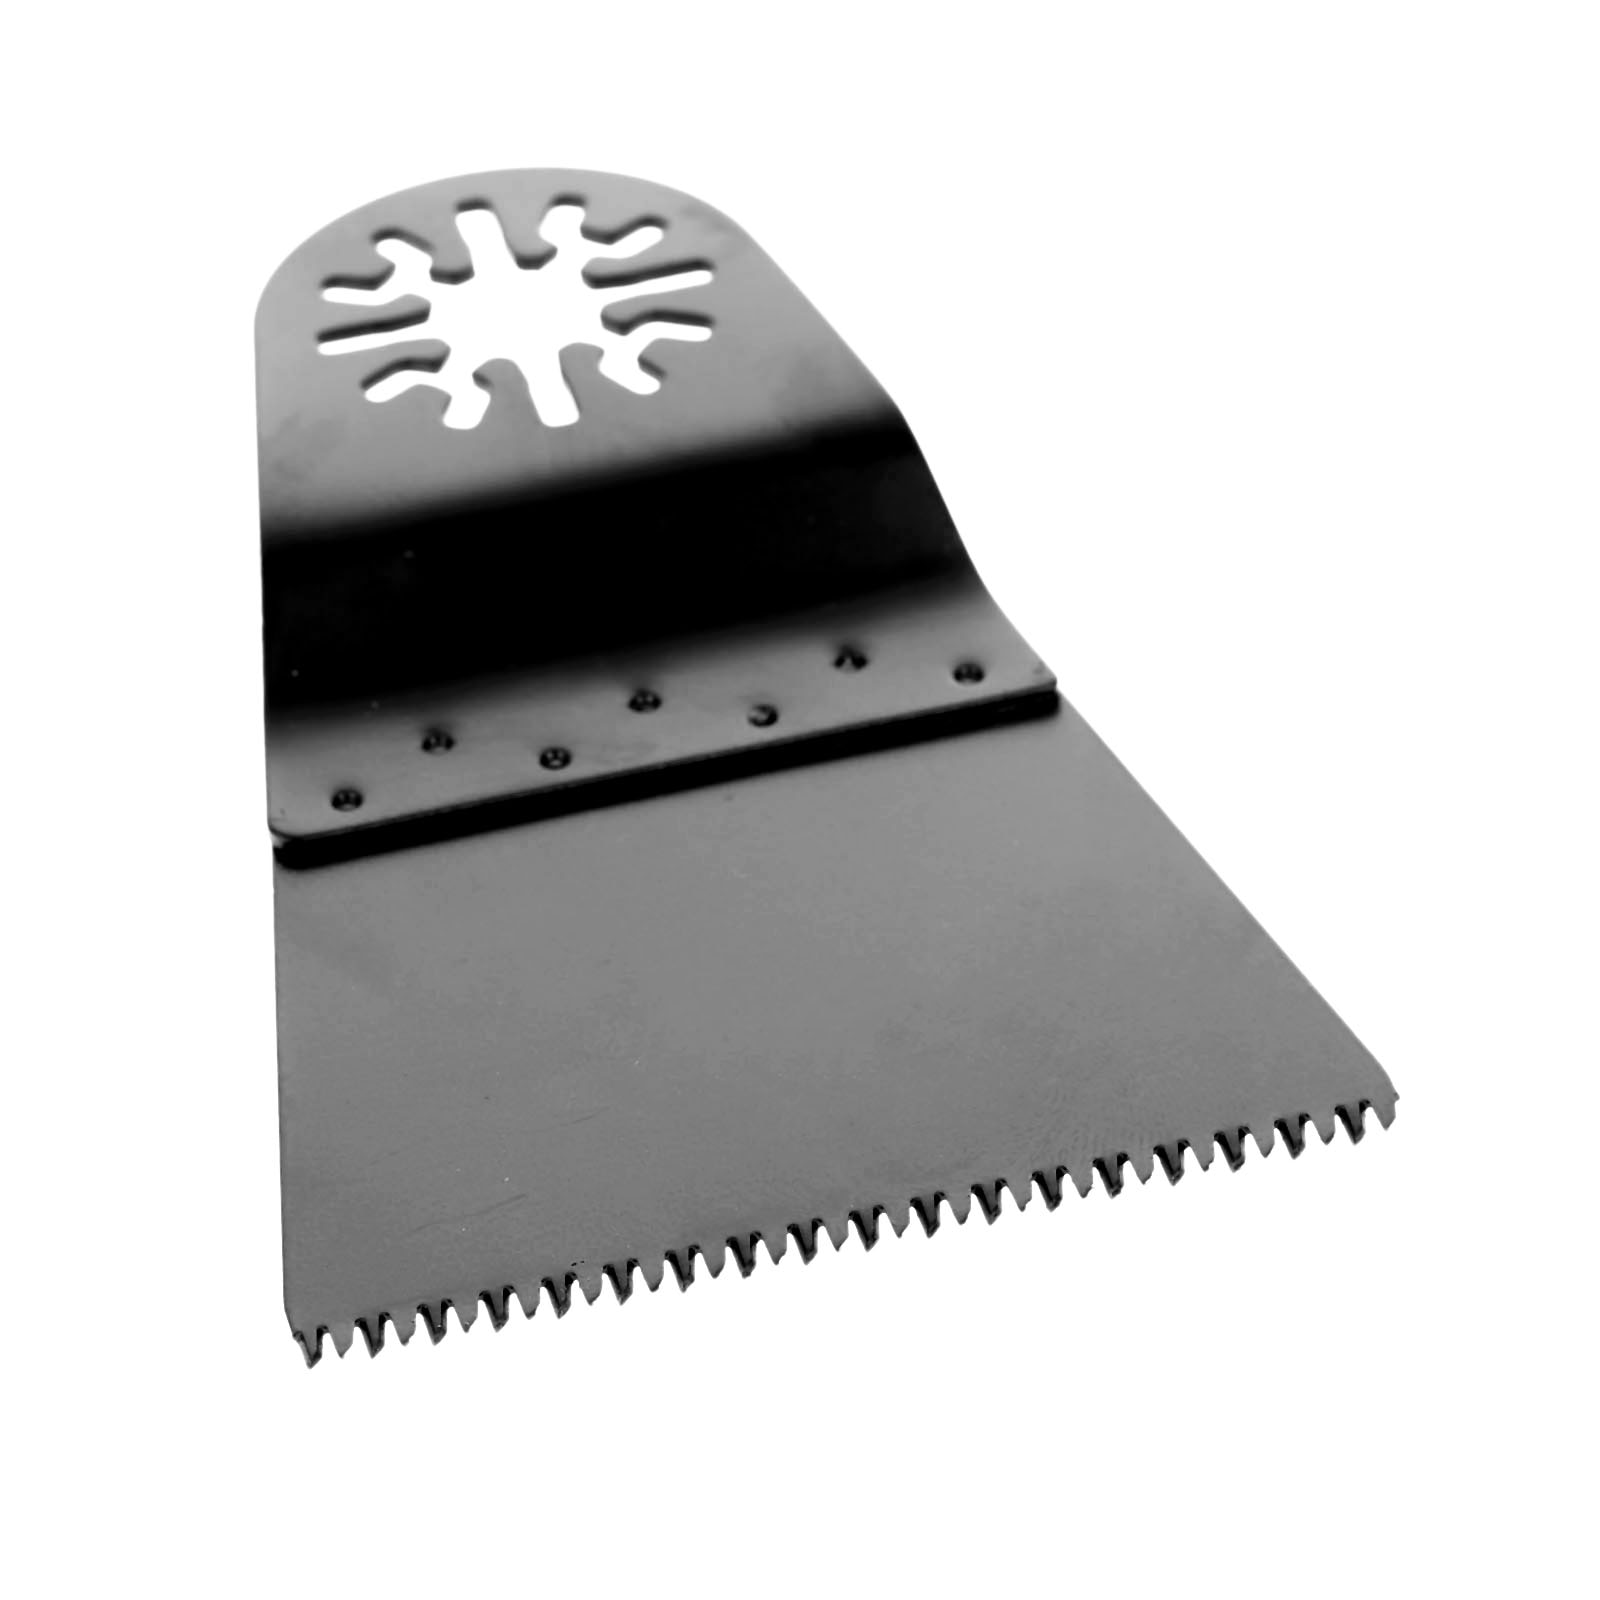 1Pc 65mm Oscillating Tools E-cut Saw Blade For Renovator Power Tools Multimaster Fein Bosch Dremel TCH Metal Cutting Wood Sawing